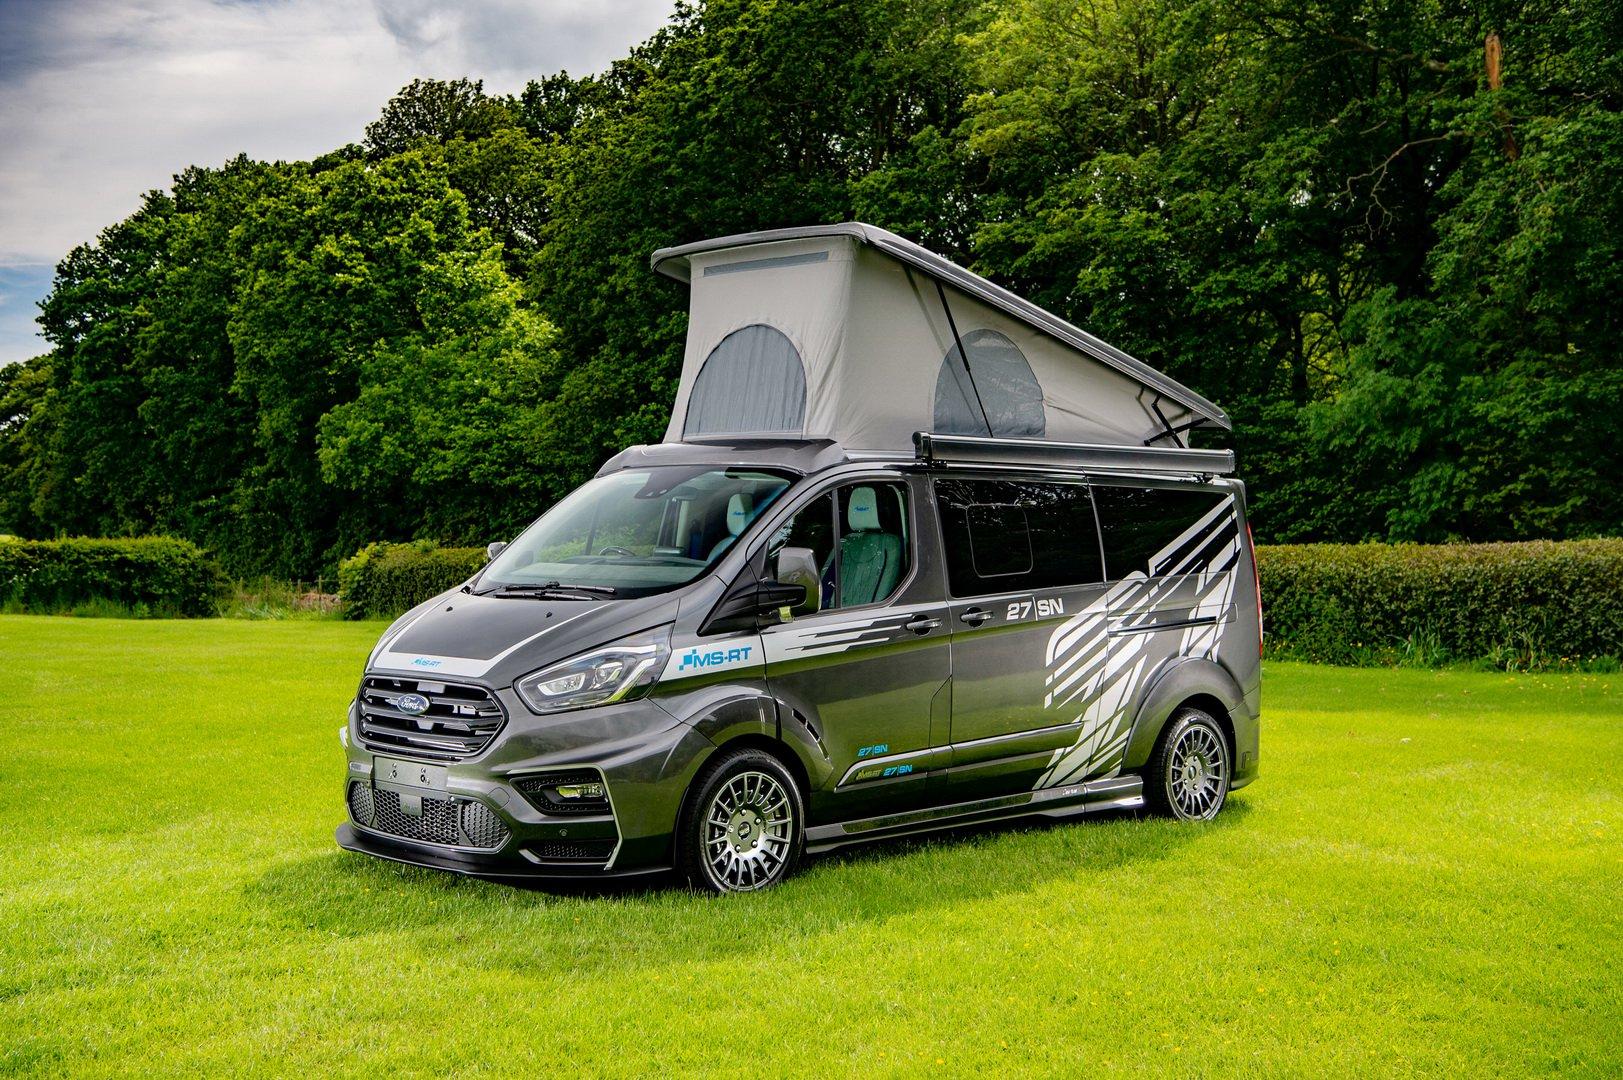 Ford Transit Custom Ms Rt Wellhouse Camper (8)